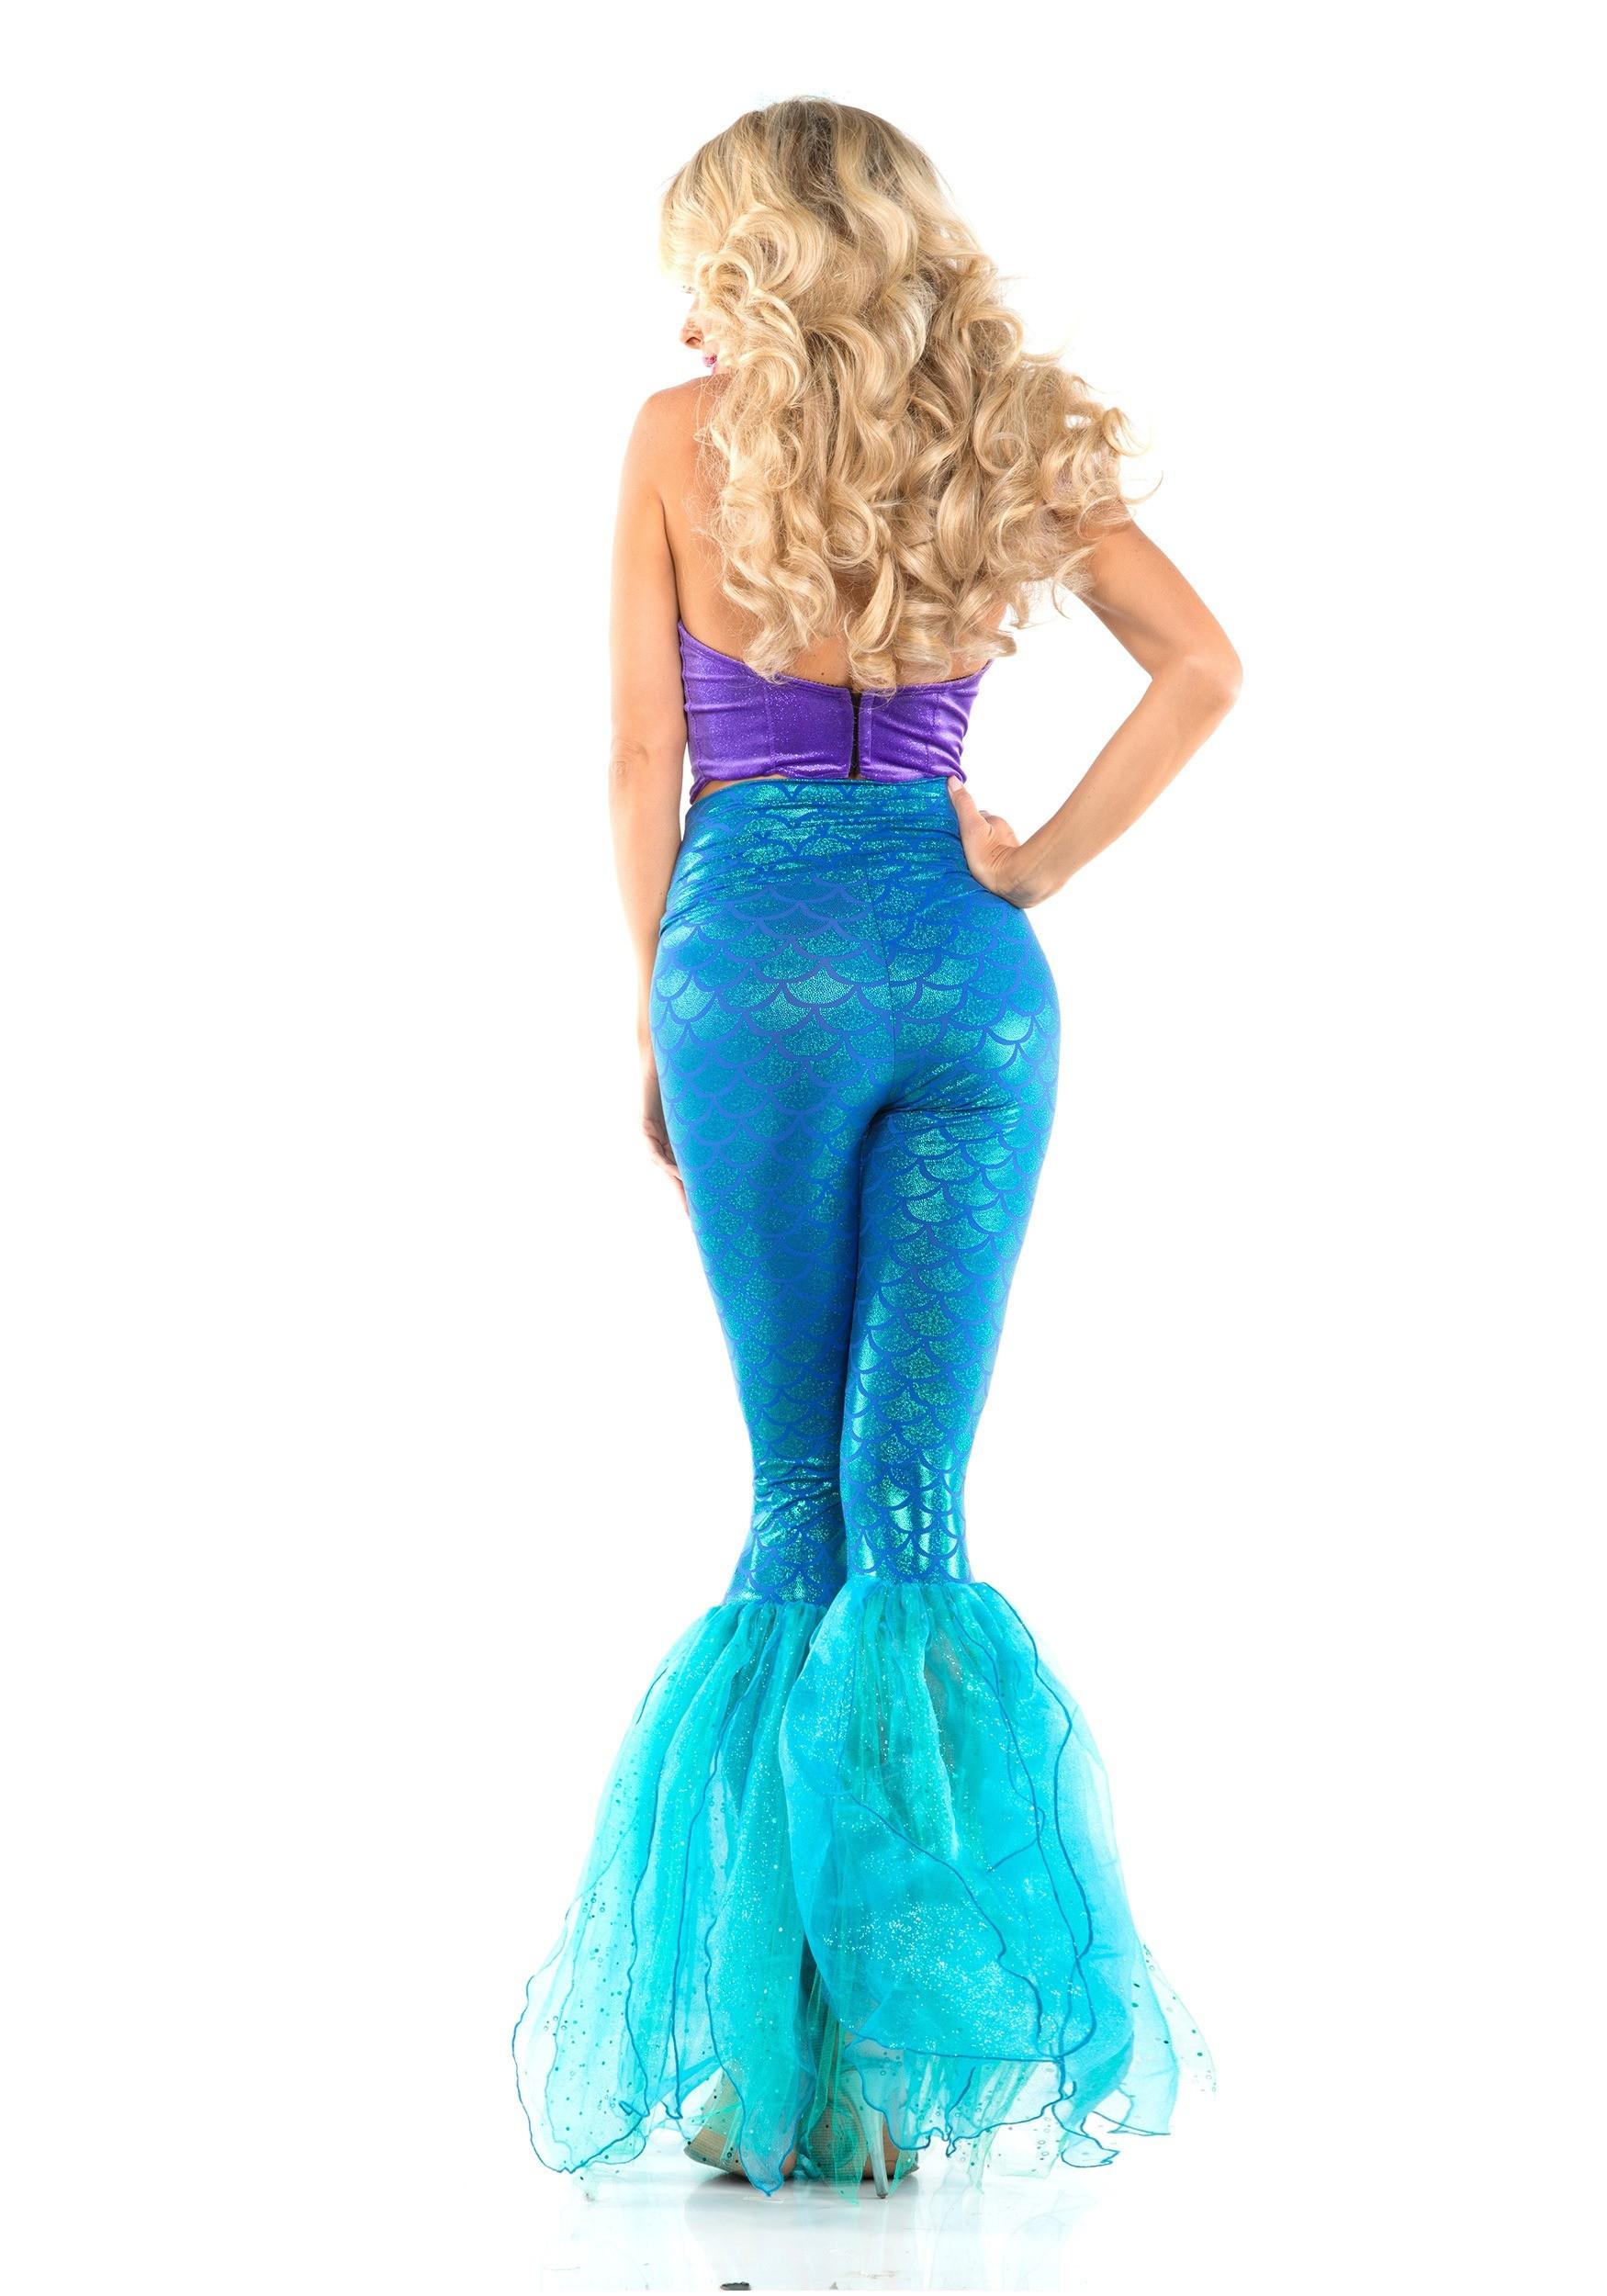 Mermaid DIY Costumes  Women s Fantasy Mermaid Costume